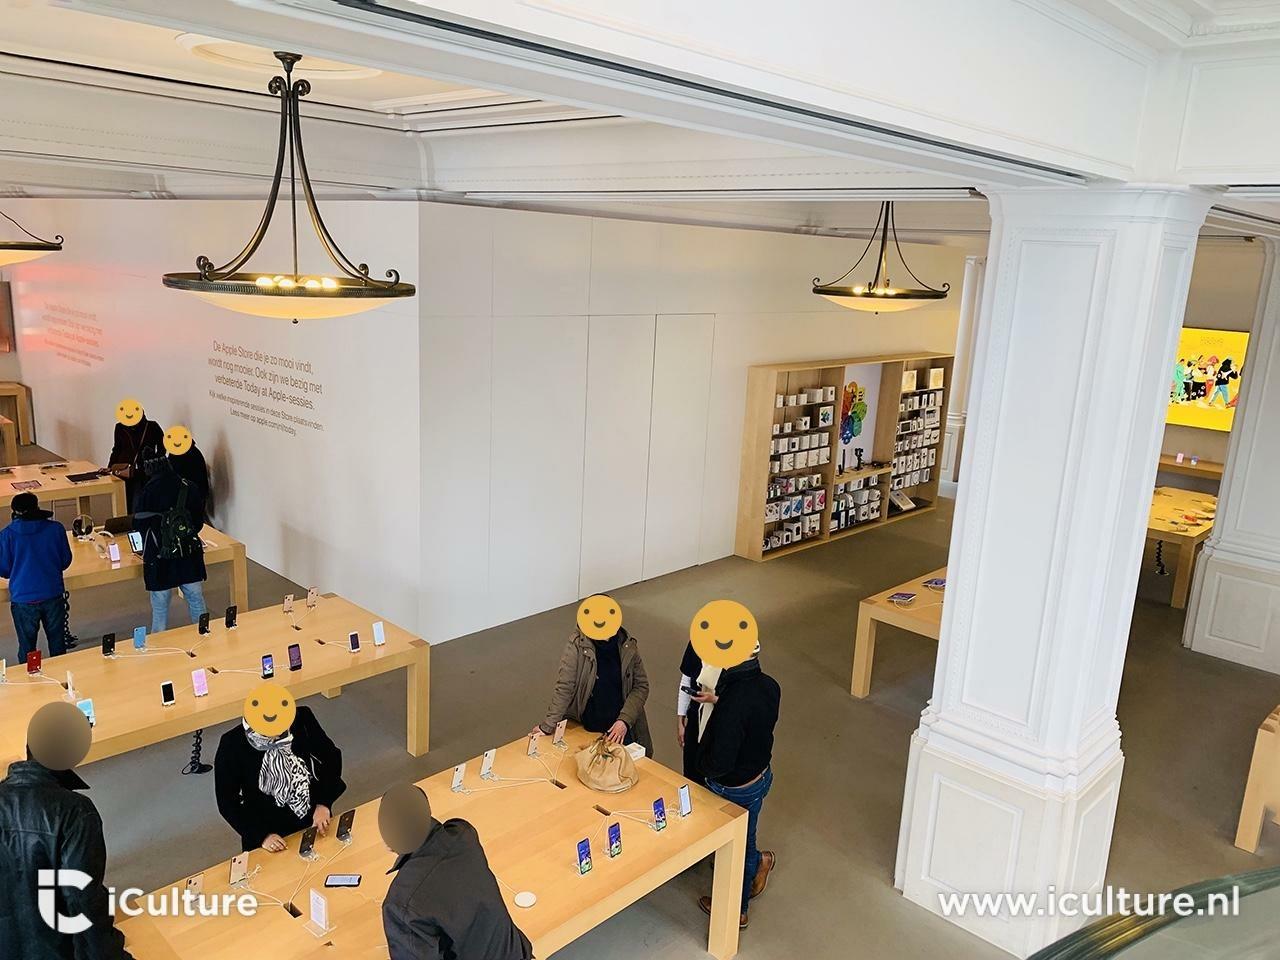 Apple Amsterdam under renovation